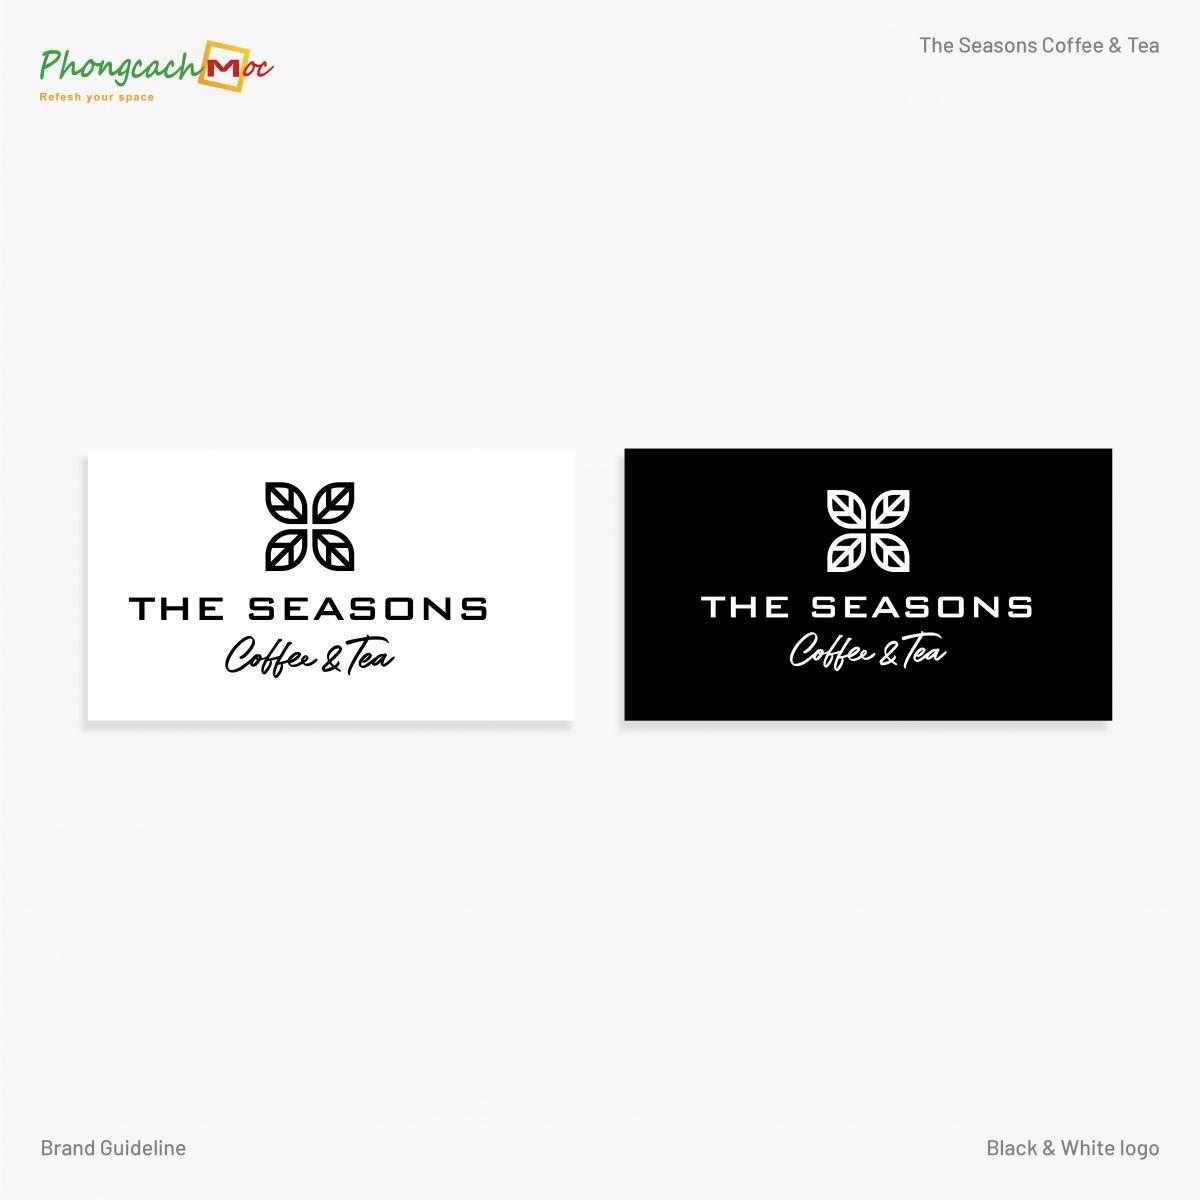 thiet-ke-nhan-dien-thuong-hieu-quan-cafe-the-seasons-vinh-long-7